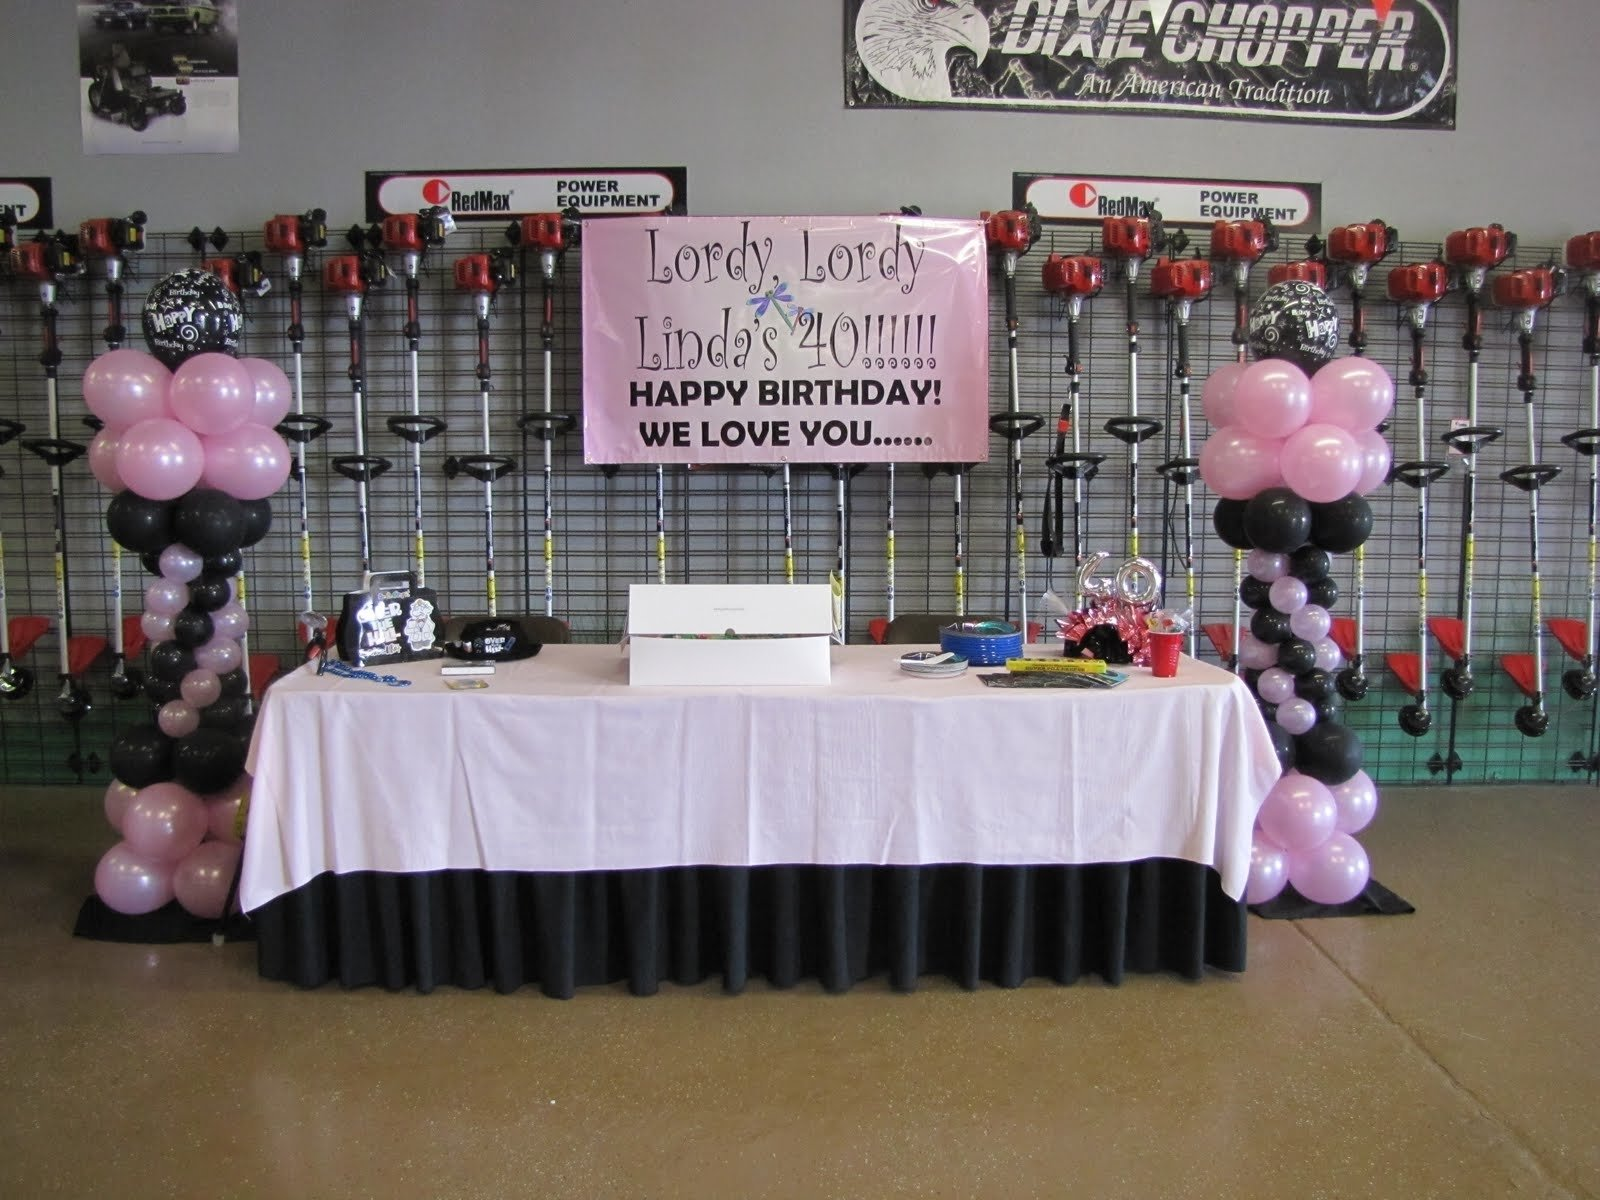 10 Nice Ideas For 40Th Birthday Celebration minus the backgroundcute idea for 40th birthday birthdays and 14 2020